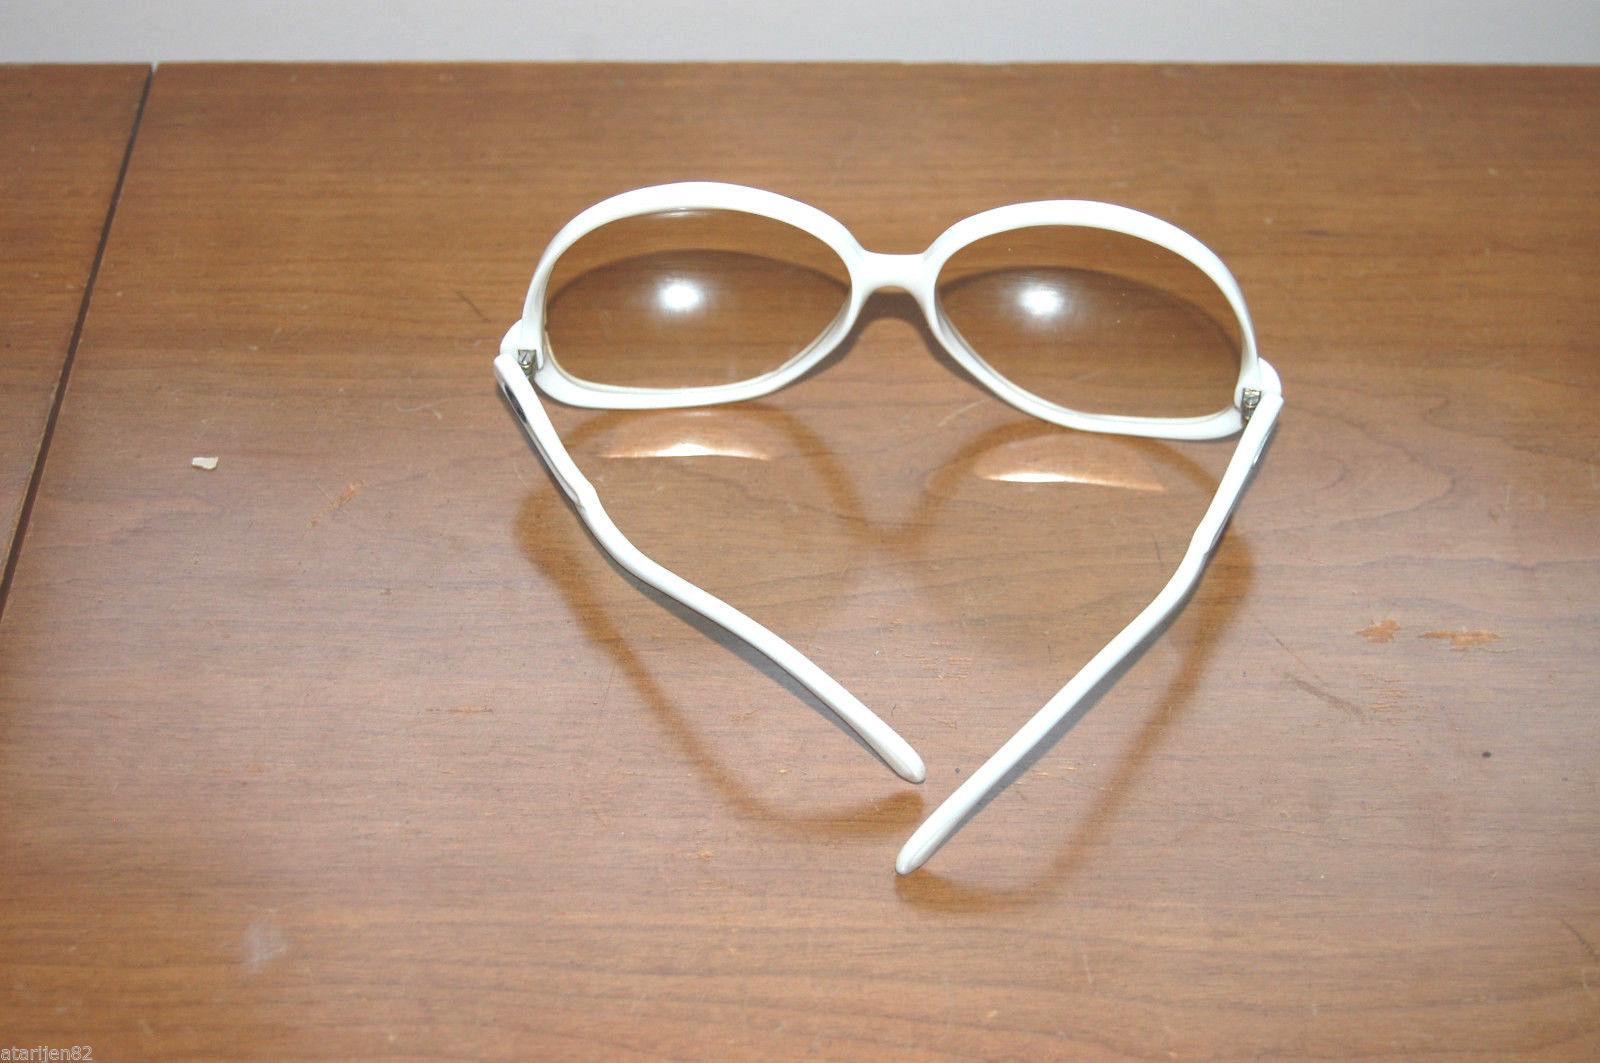 78a307cd34 vintage white round oversize sunglasses mid century midcentury Safilo  Jamaica